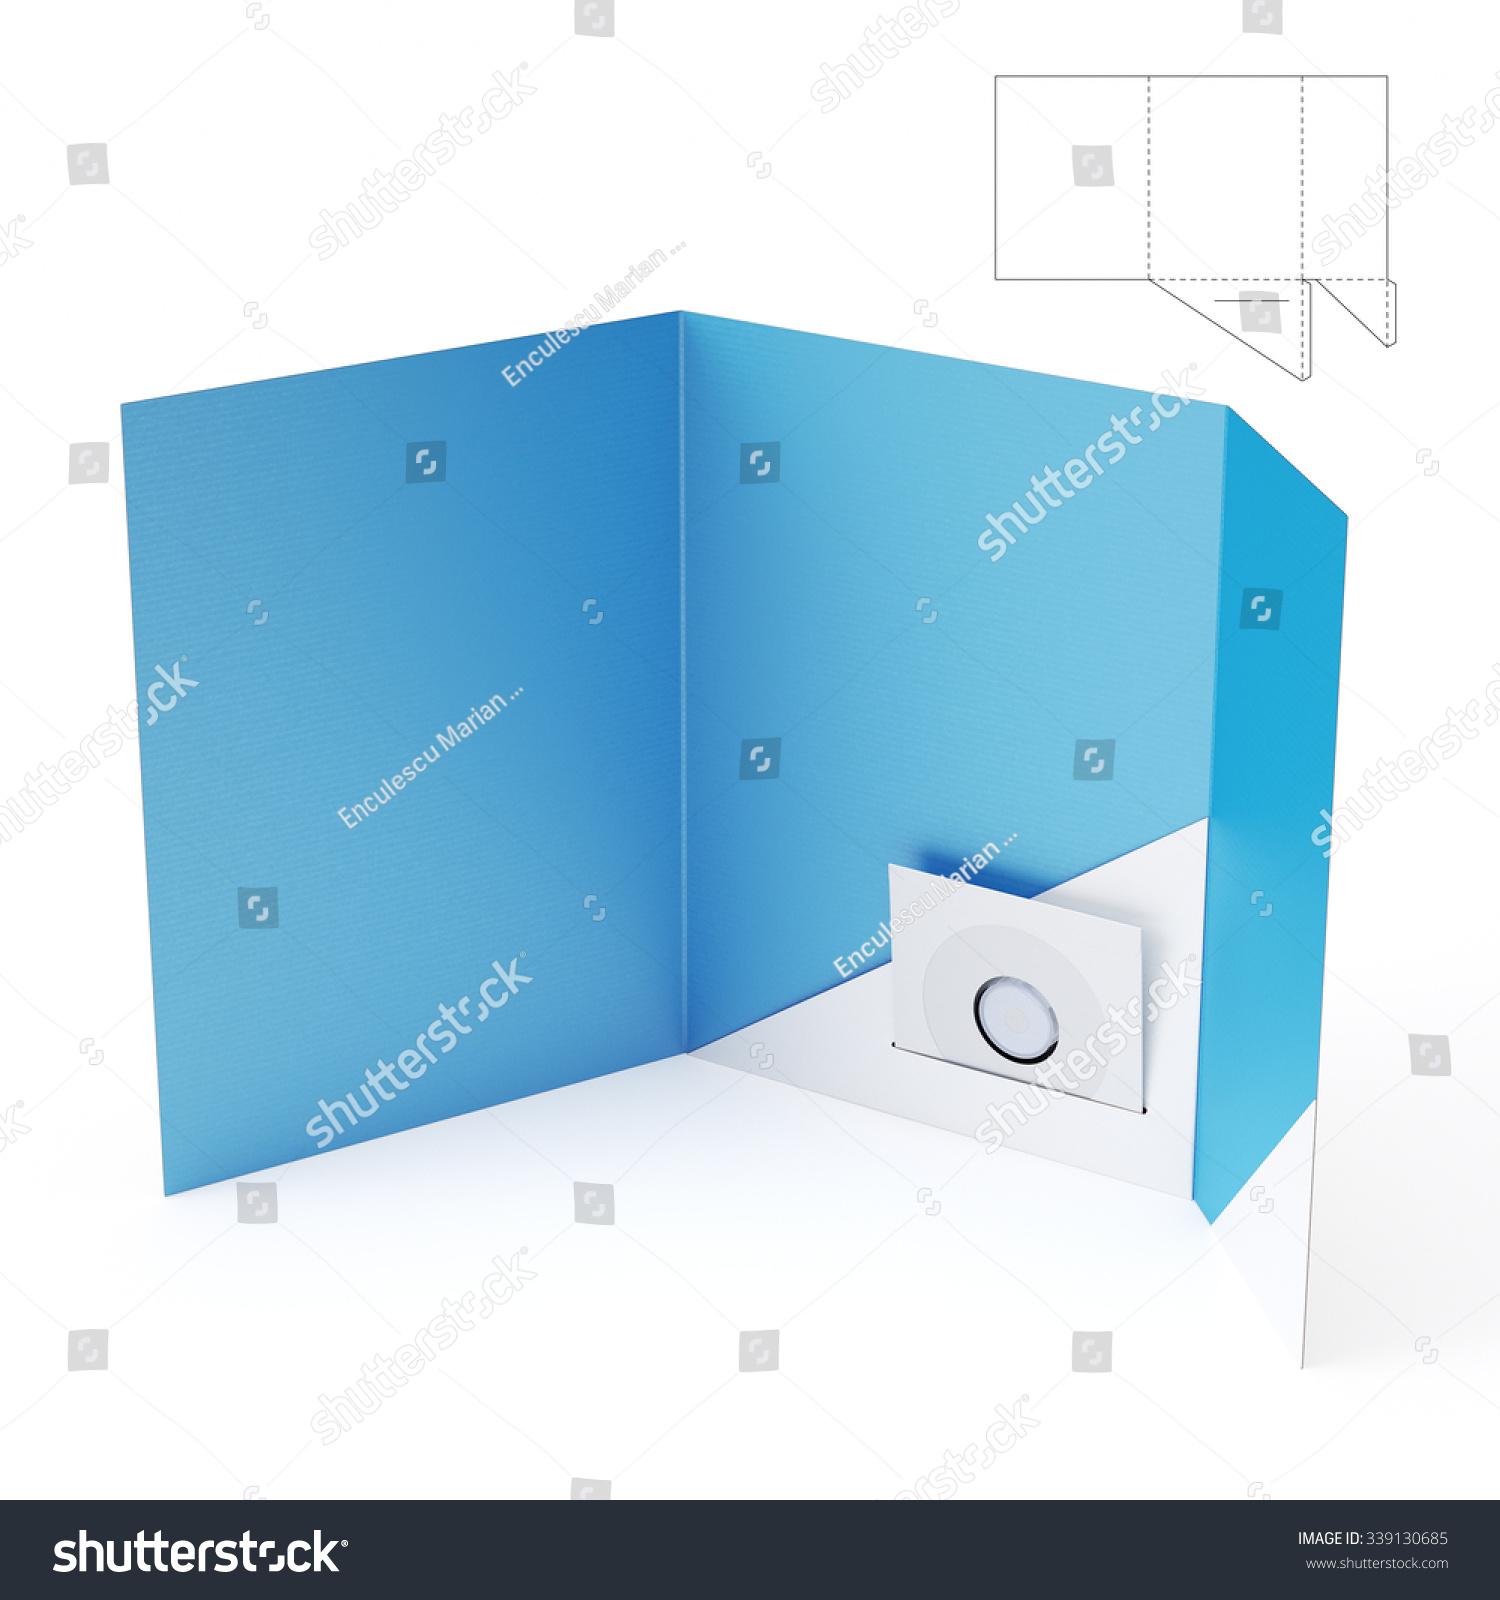 brochure folder with cd dvd pocket and die cut template stock photo 339130685 shutterstock. Black Bedroom Furniture Sets. Home Design Ideas